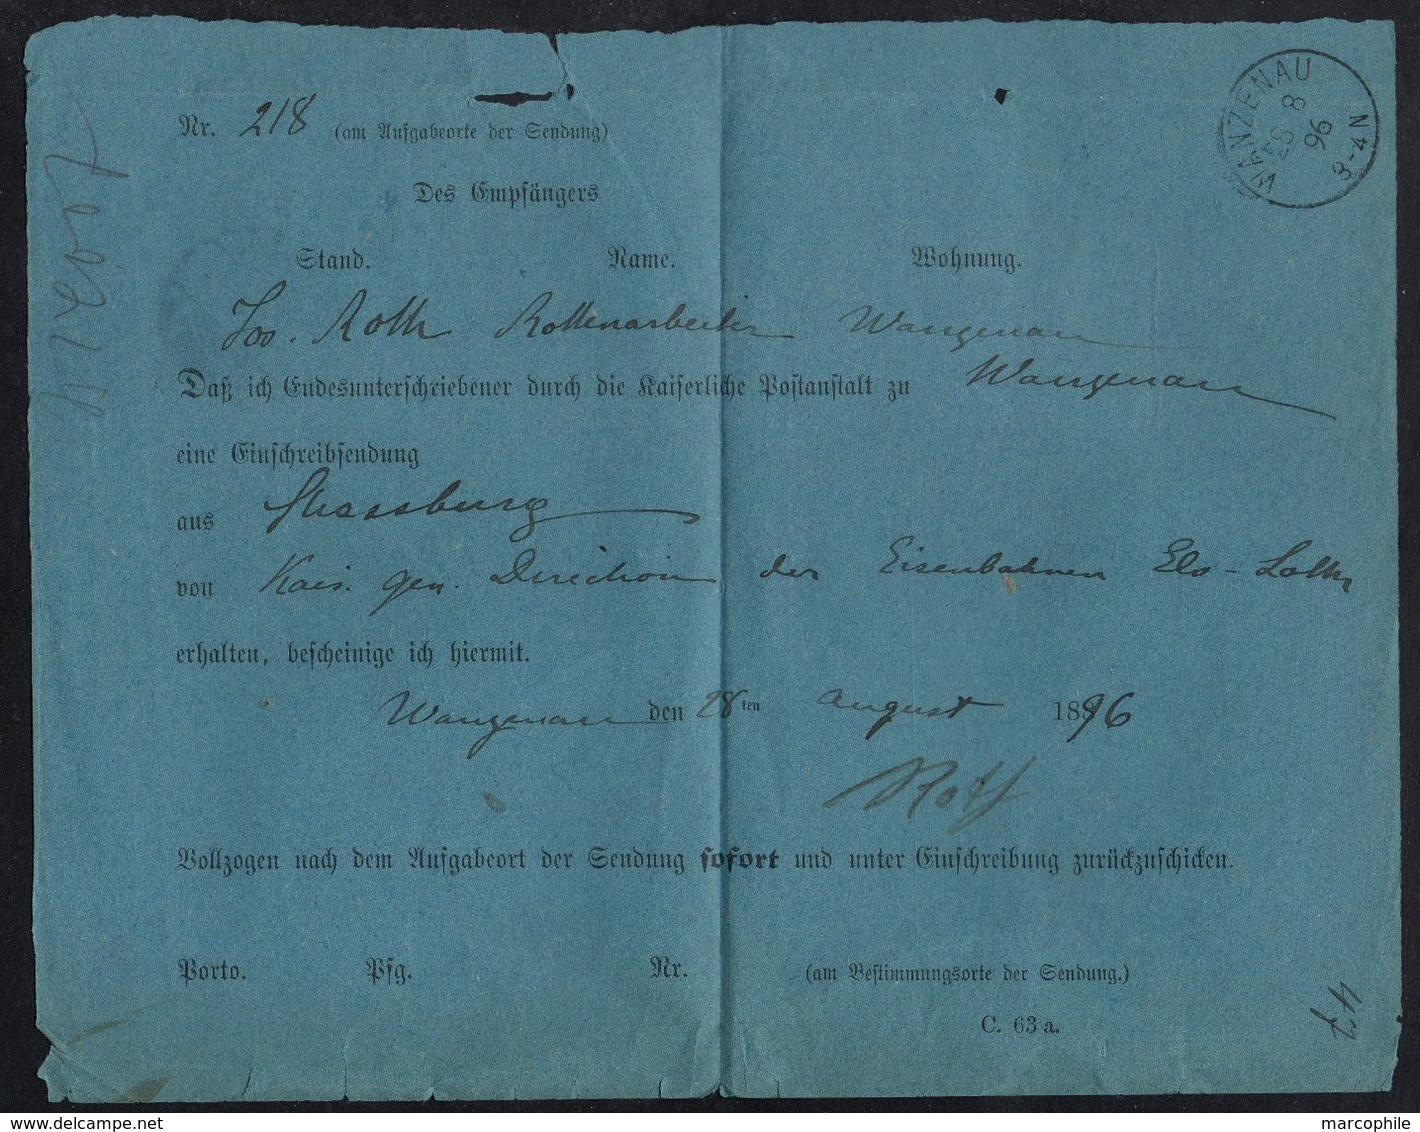 WANZENAU - WANTZENAU - ALSACE / 1896 RECEPISSE DE LETTRE RECOMMANDEE POUR STRASBOURG (ref 7769) - Elsass-Lothringen